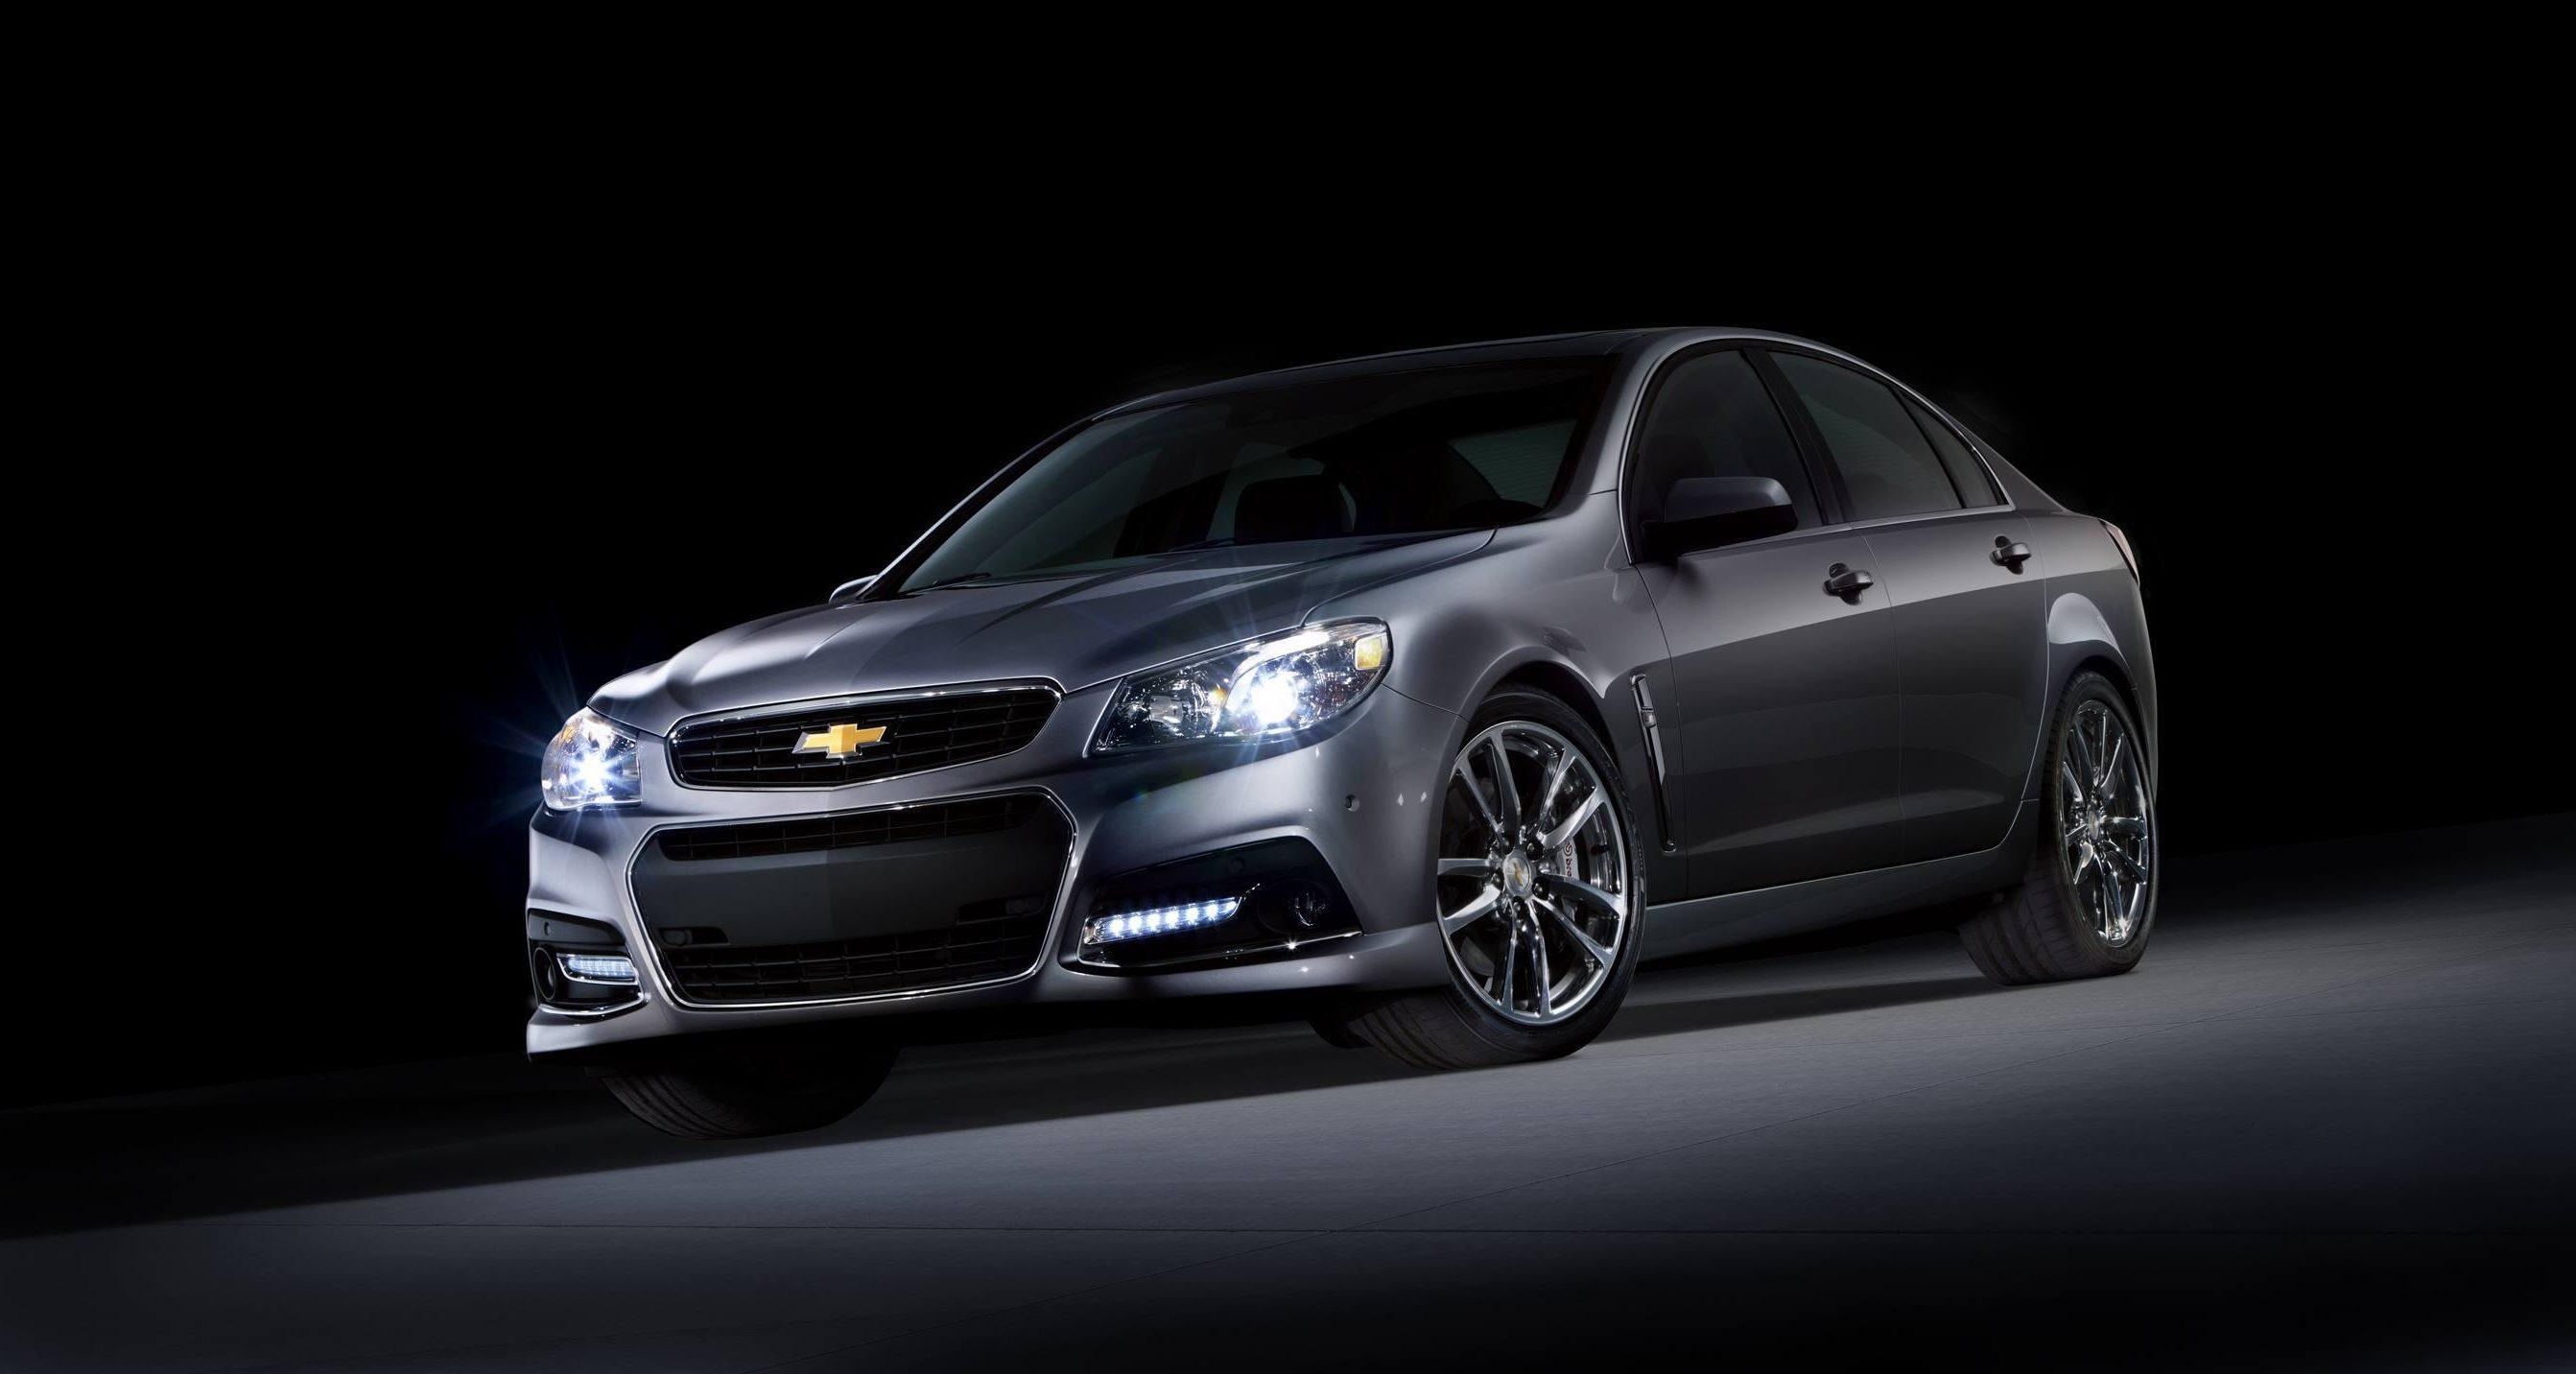 The Chevrolet SS sedan in gray